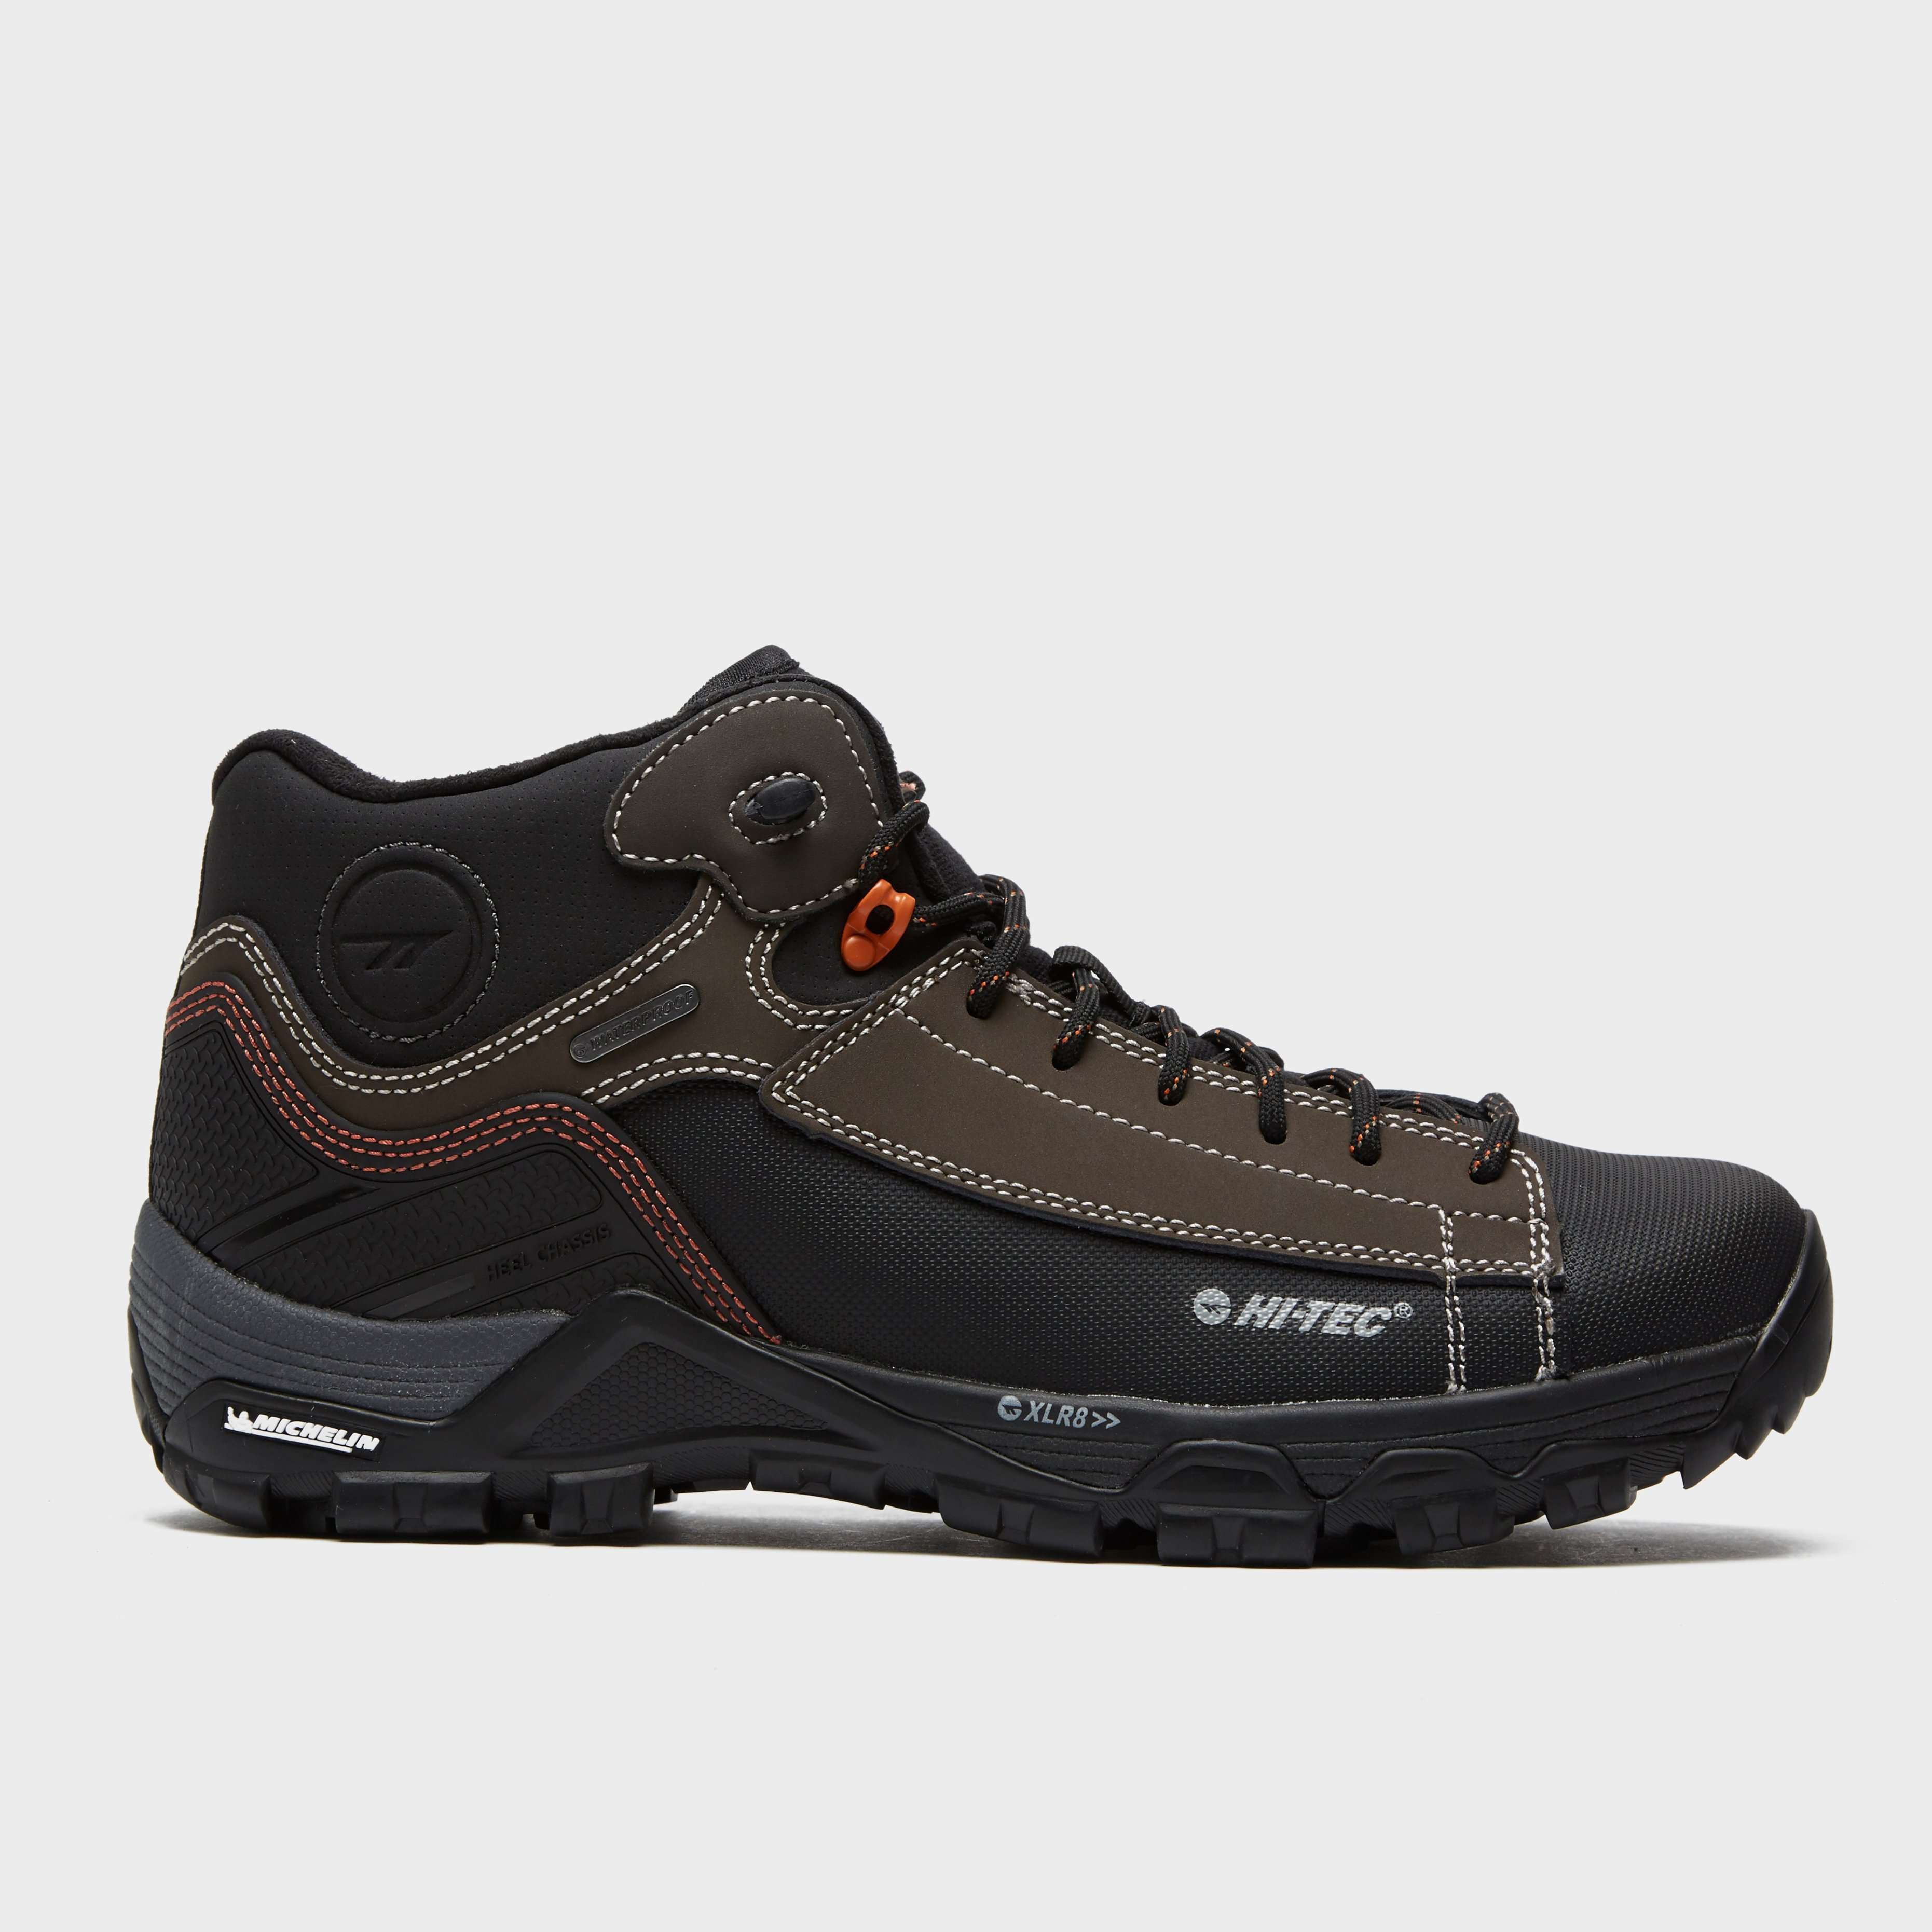 HI TEC Men's Trail Ox Chukka I Waterproof Boot